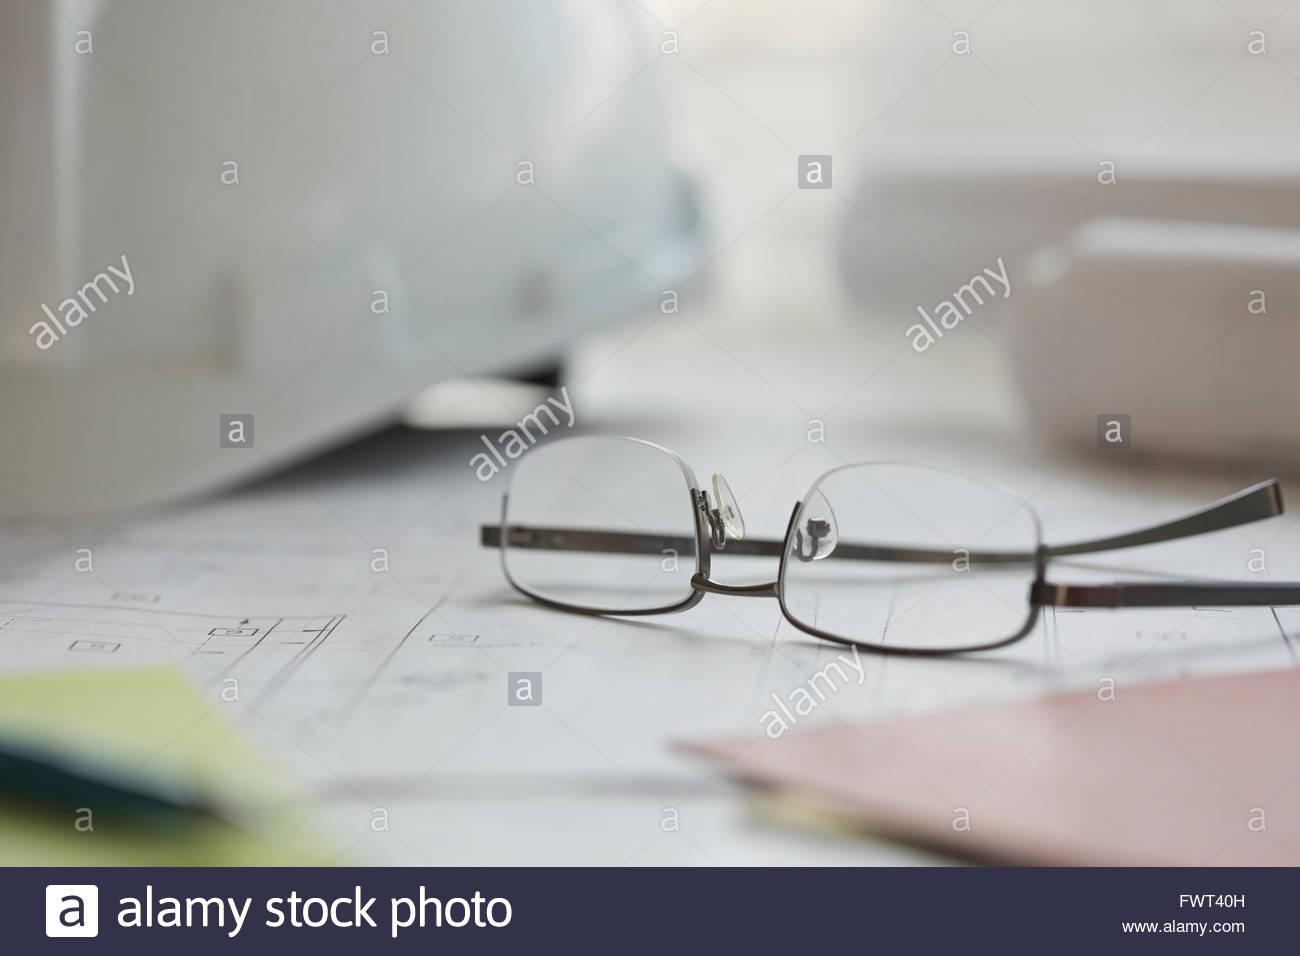 Eyeglasses and blueprint on office desk - Stock Image